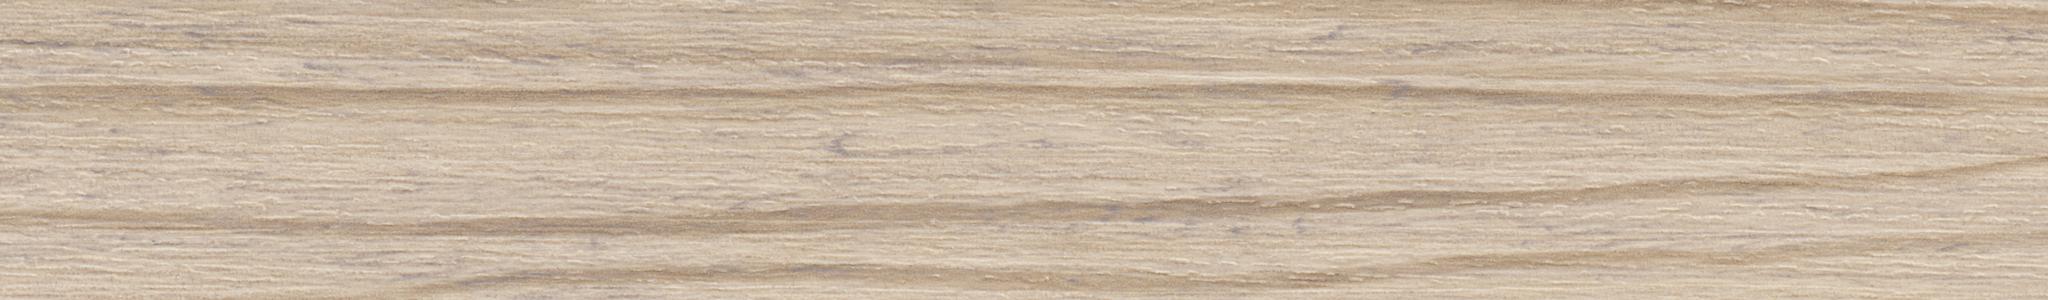 HD 254435 ABS Edge Cult Pine Melange Pore Softmatt